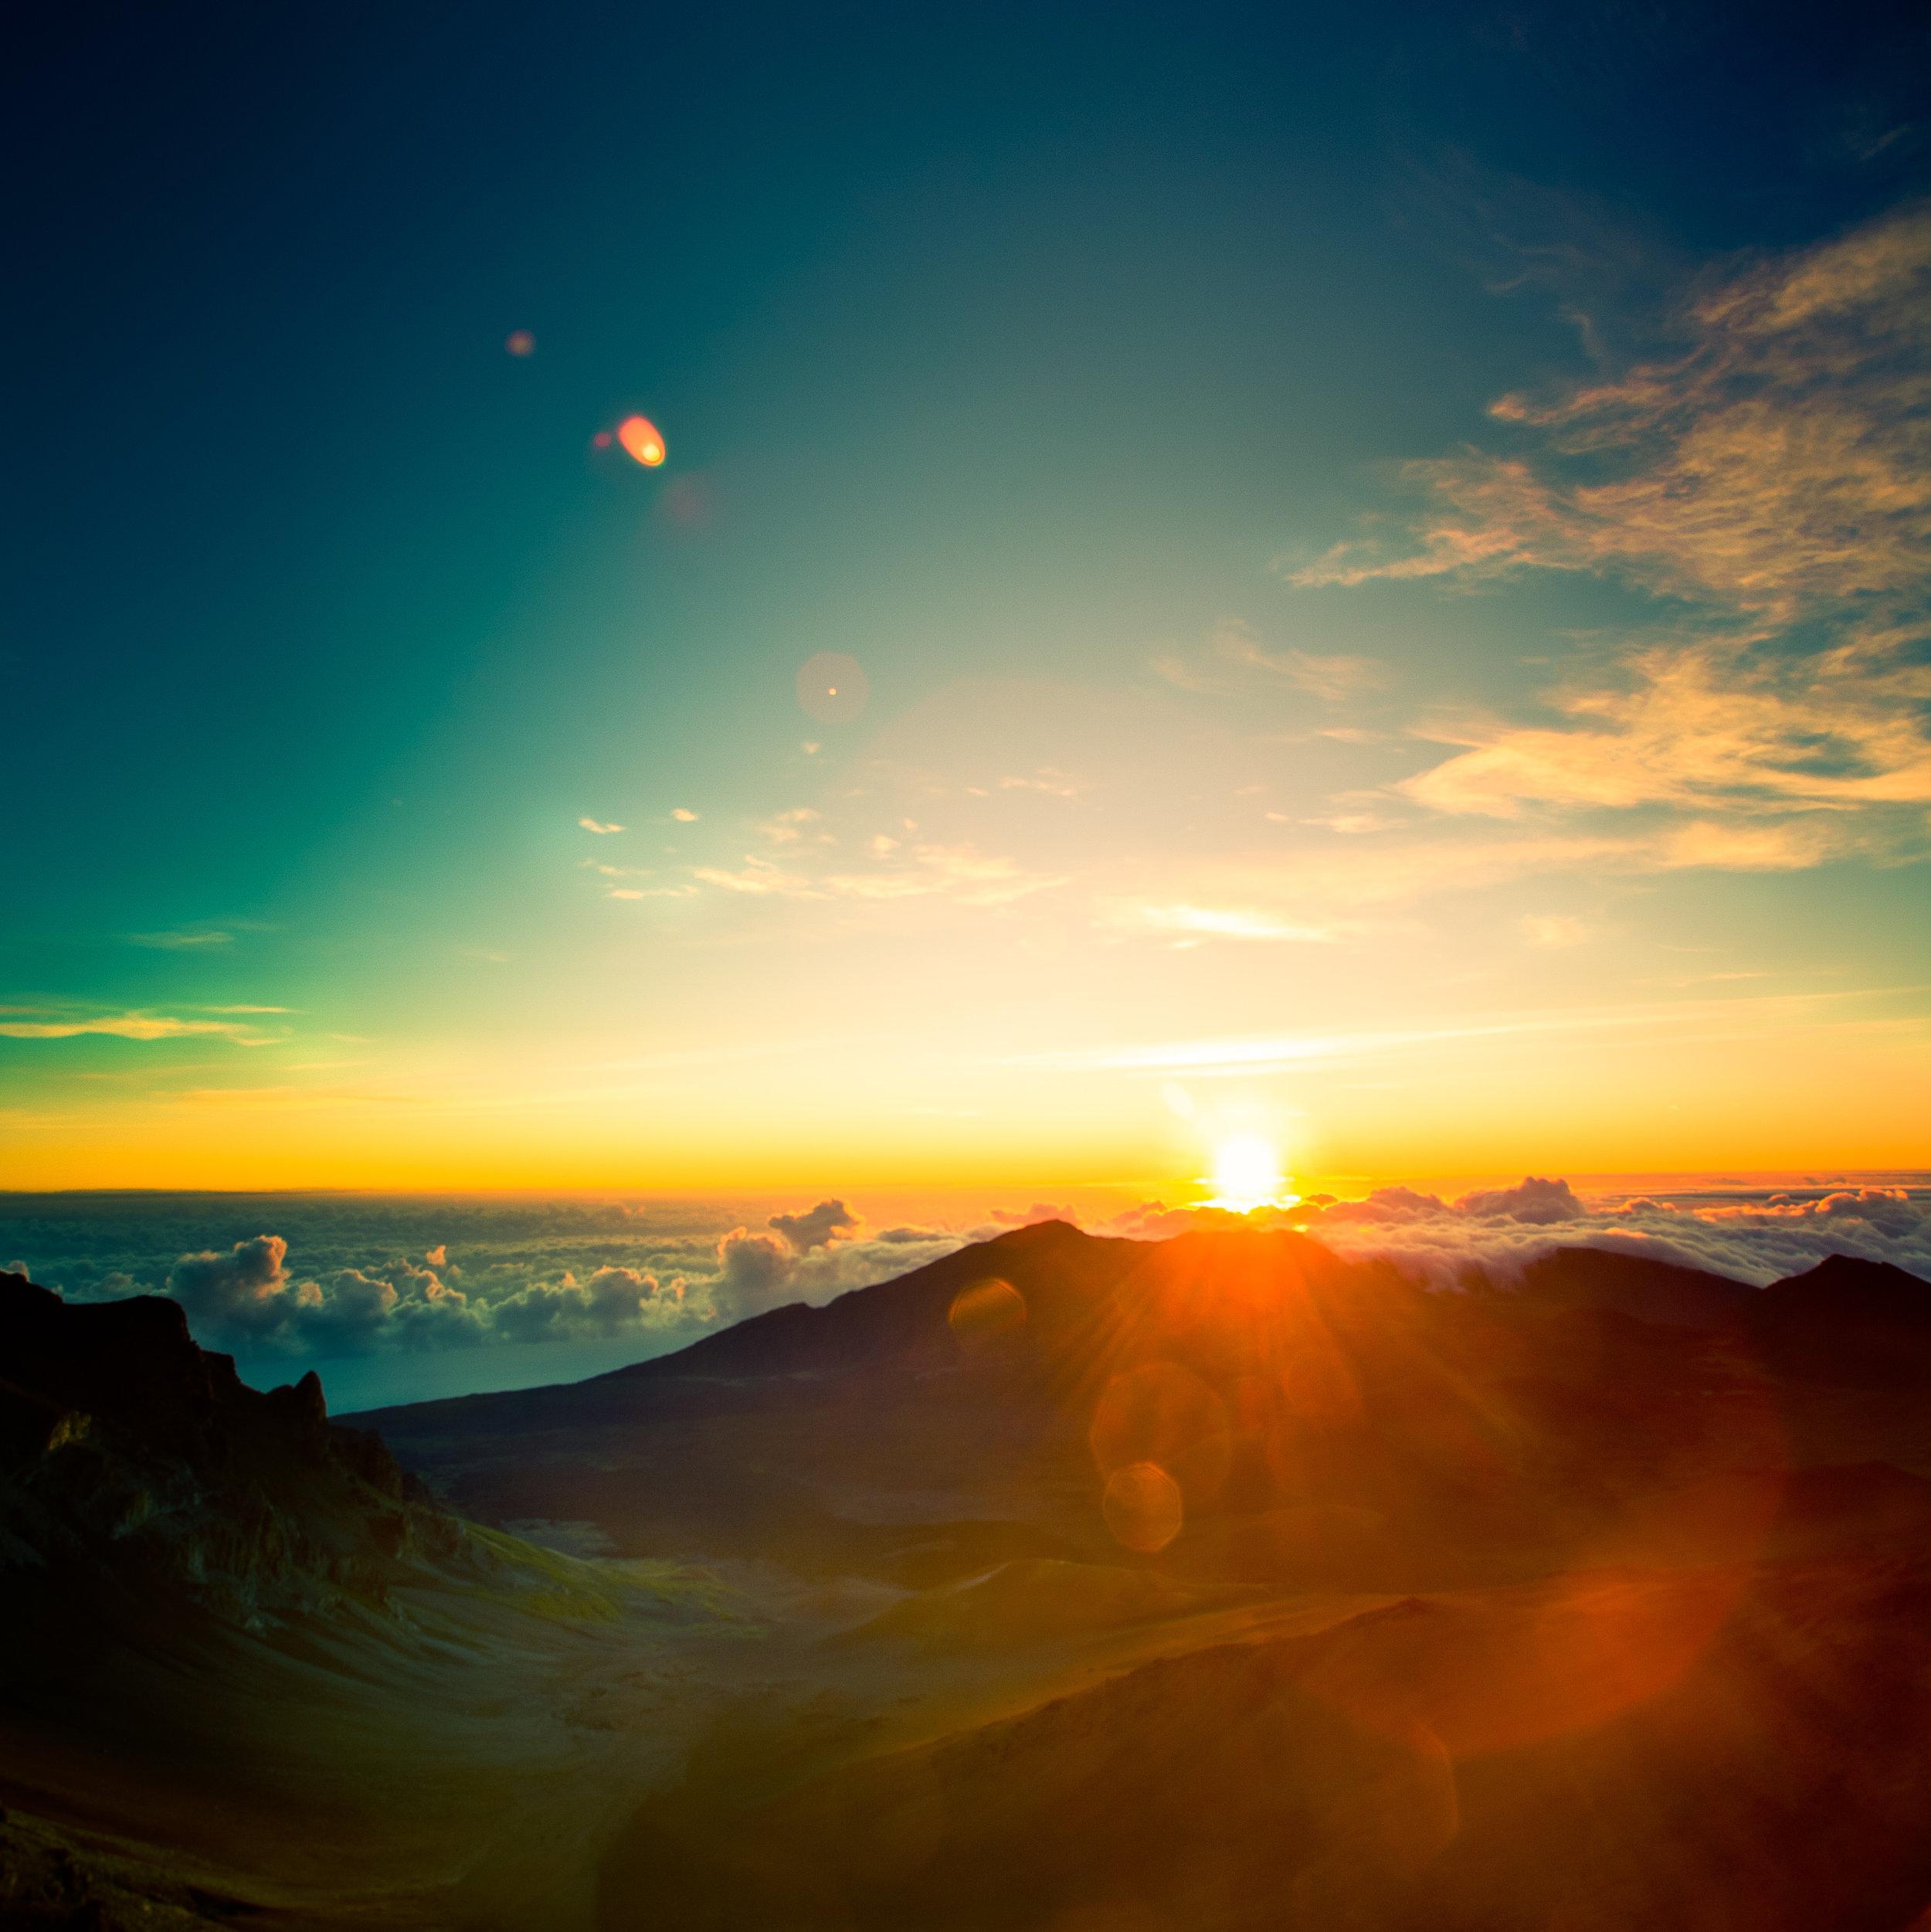 Maui Haleakakla sunrise clouds house sun flare joy wonder